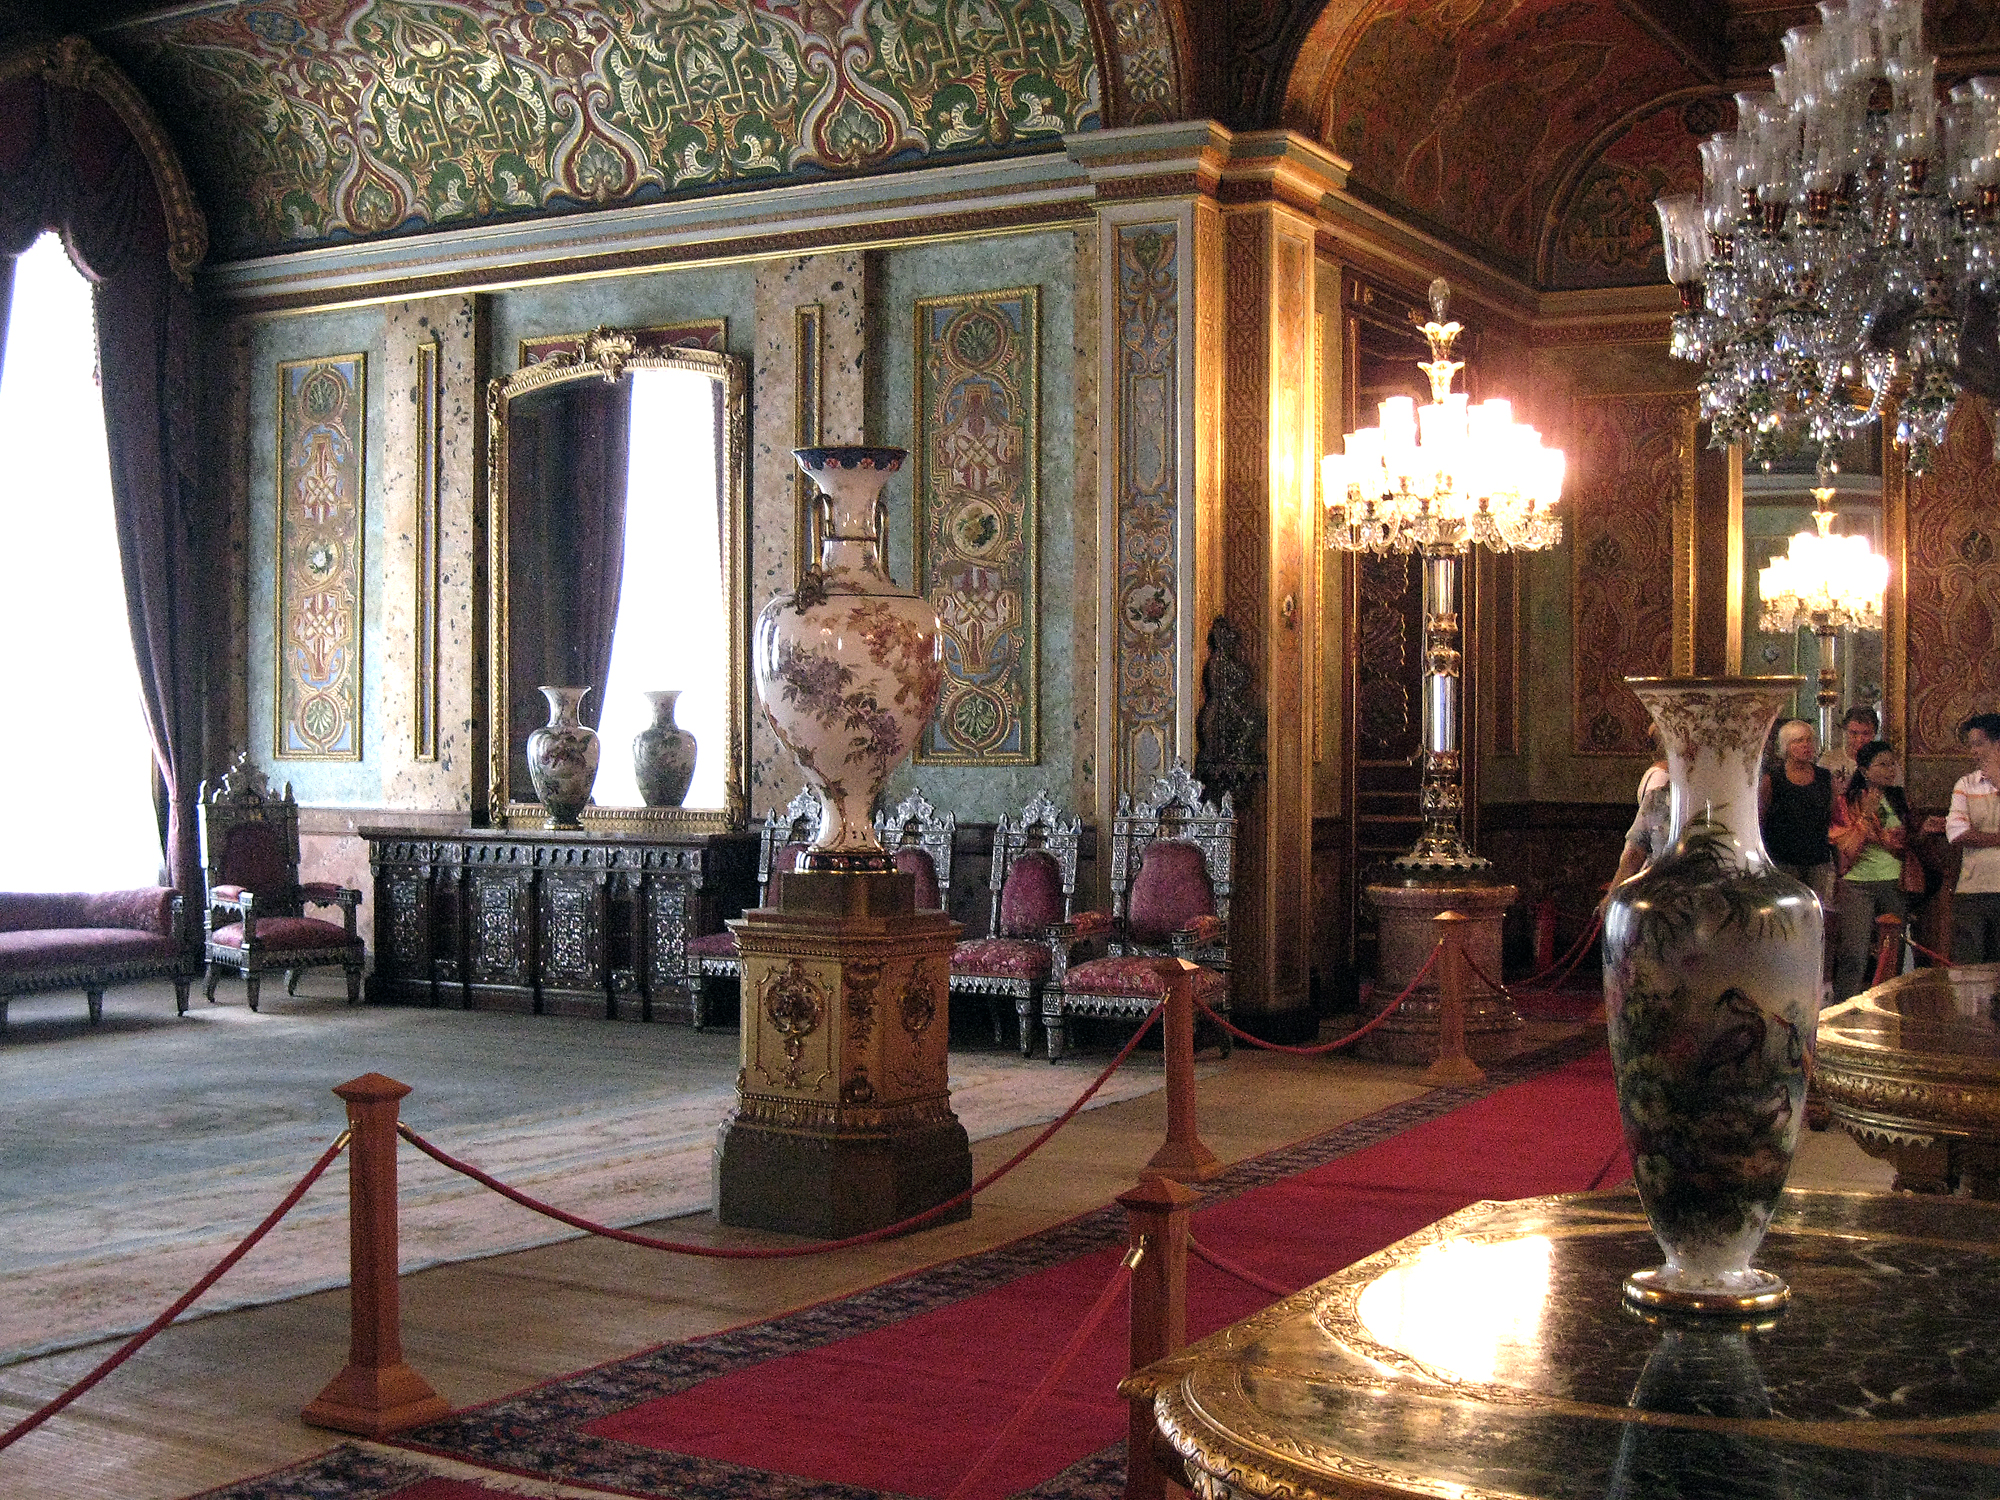 File:Beylerbeyi-palace-interior.jpg - Wikipedia, the free encyclopedia